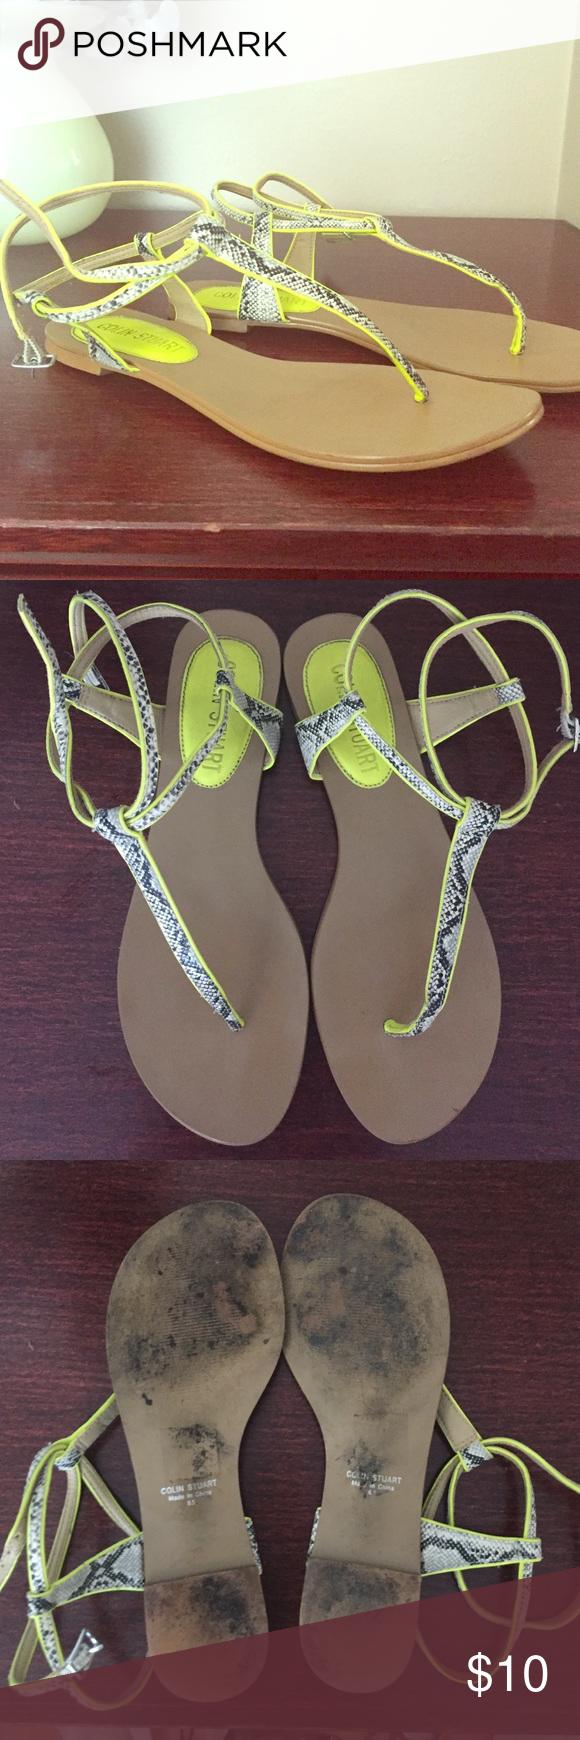 Colin Stuart sandals Great summer sandals! Yellow snakeskin design. Colin Stuart Shoes Sandals